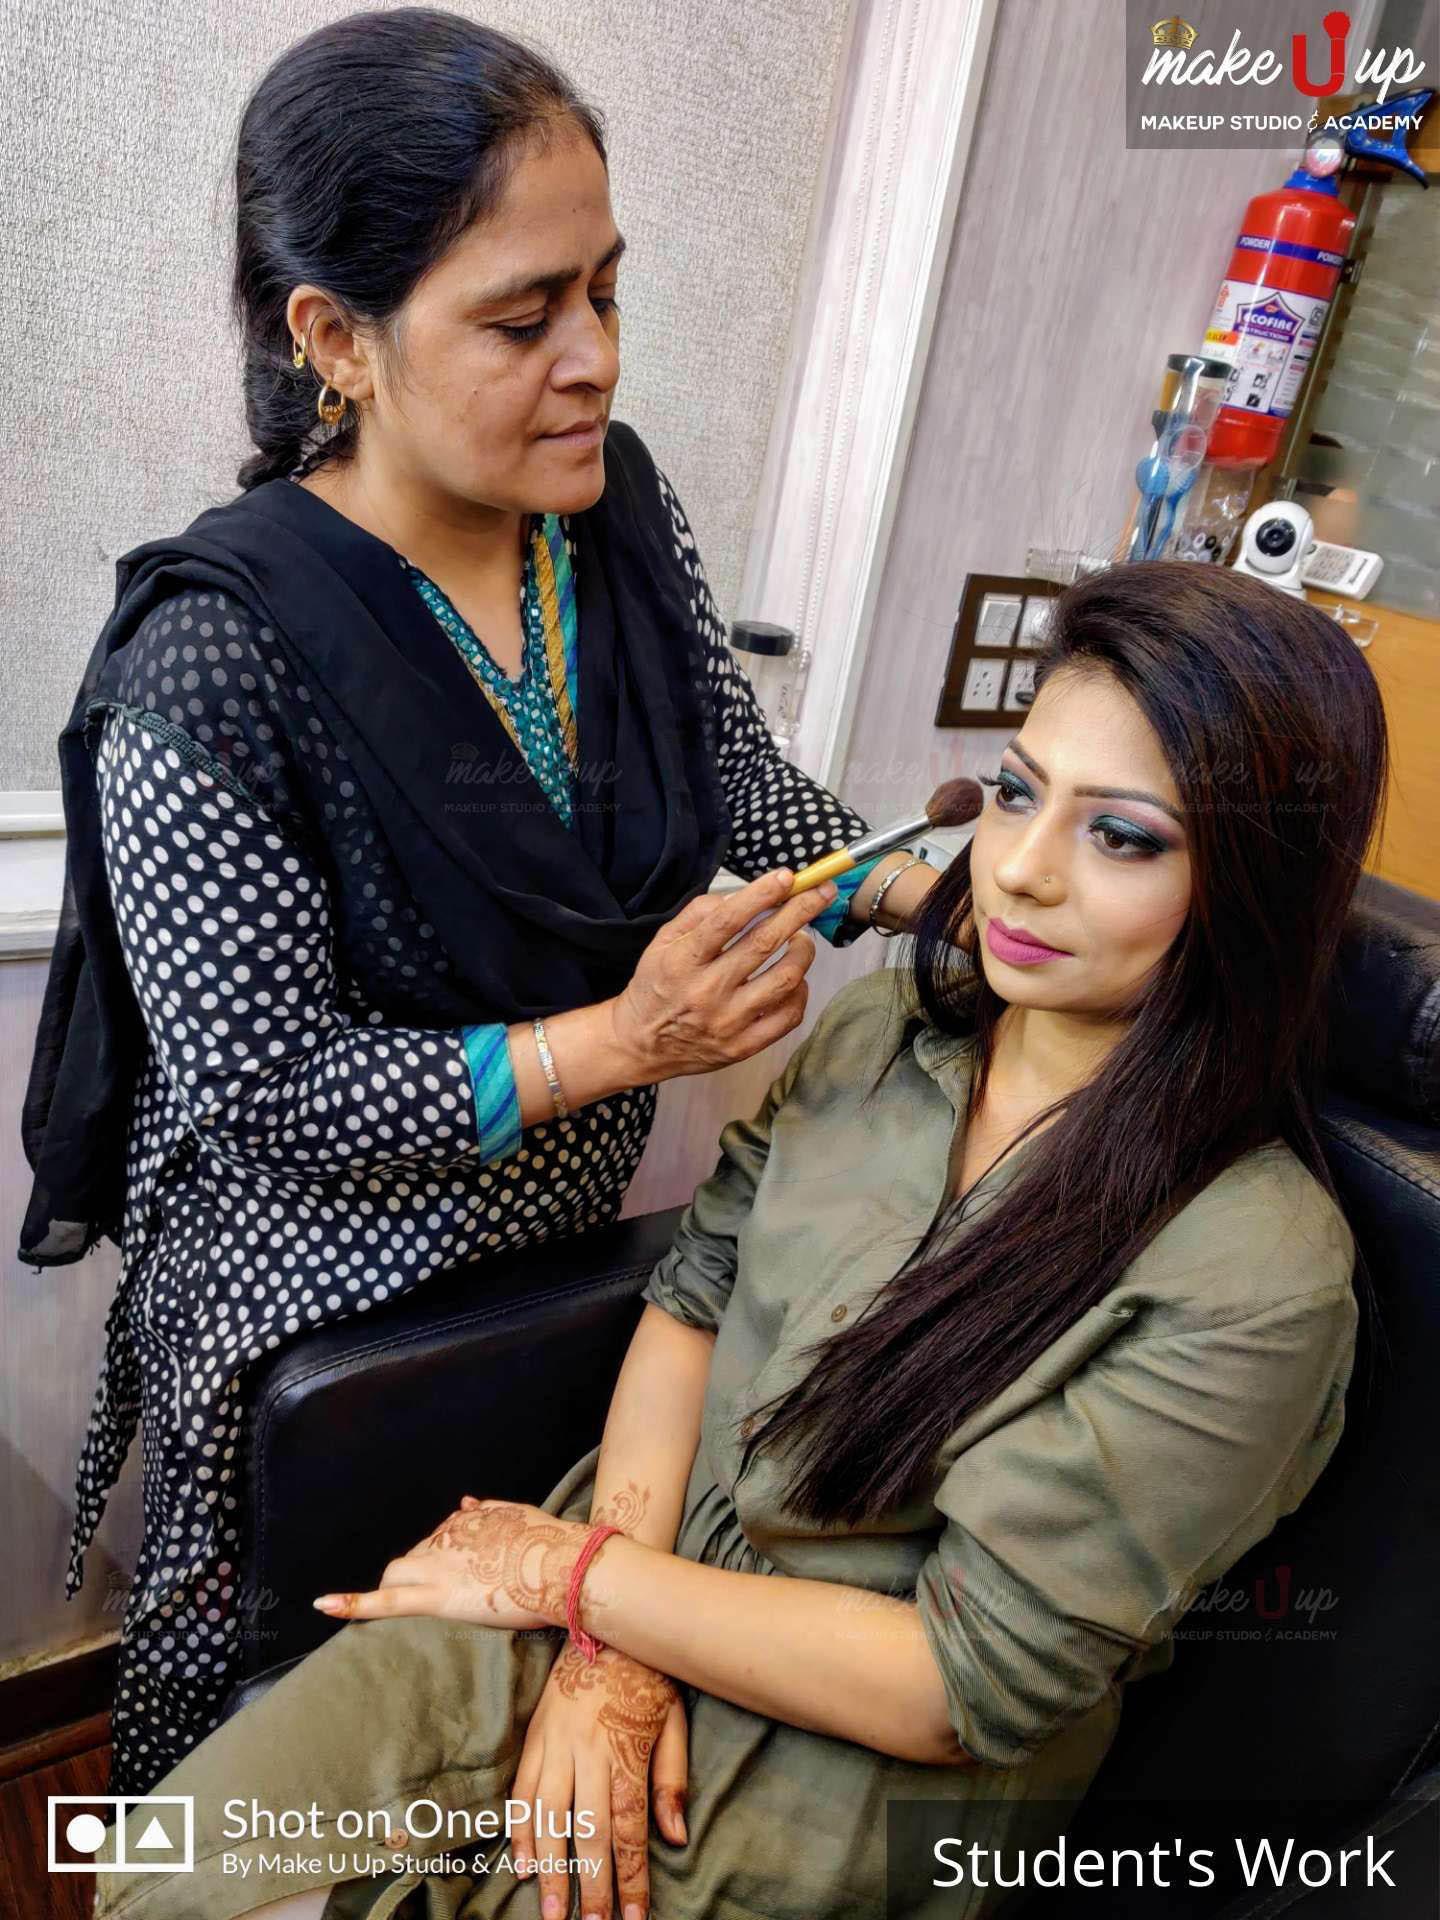 students applying makeup